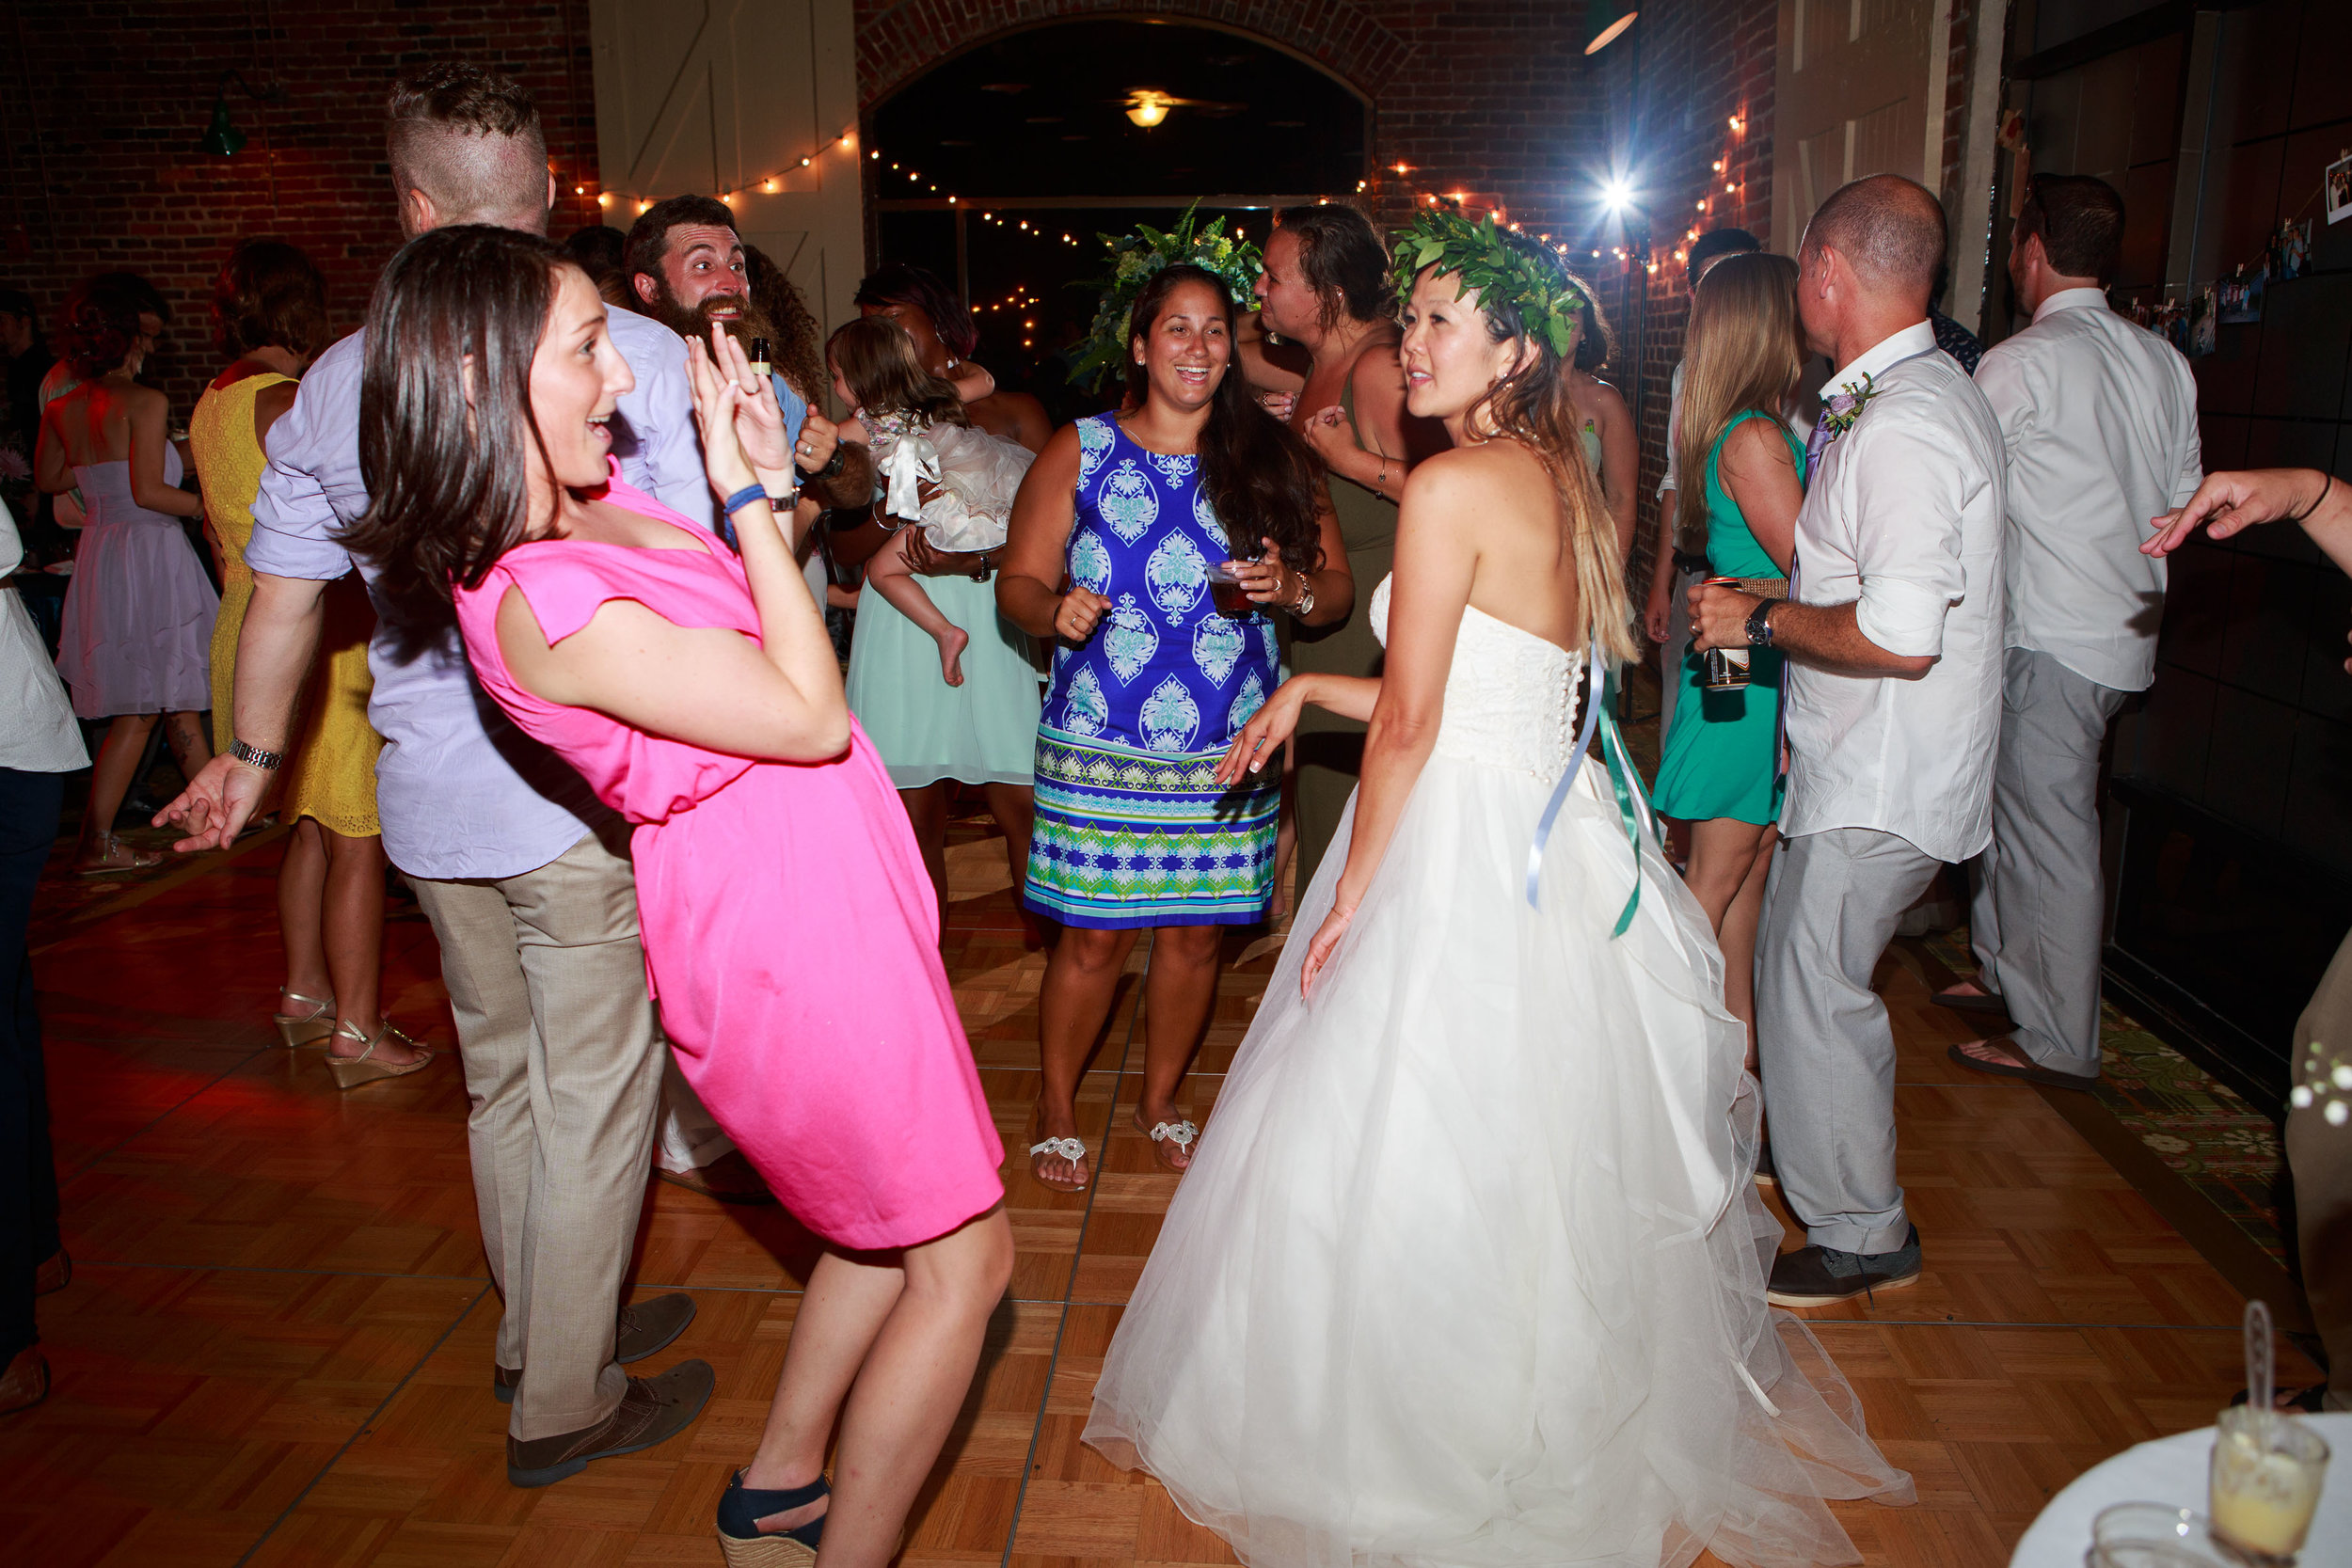 North_Carolina_Wedding_Photographer_Tiffany_Abruzzo_Reception_266.jpg